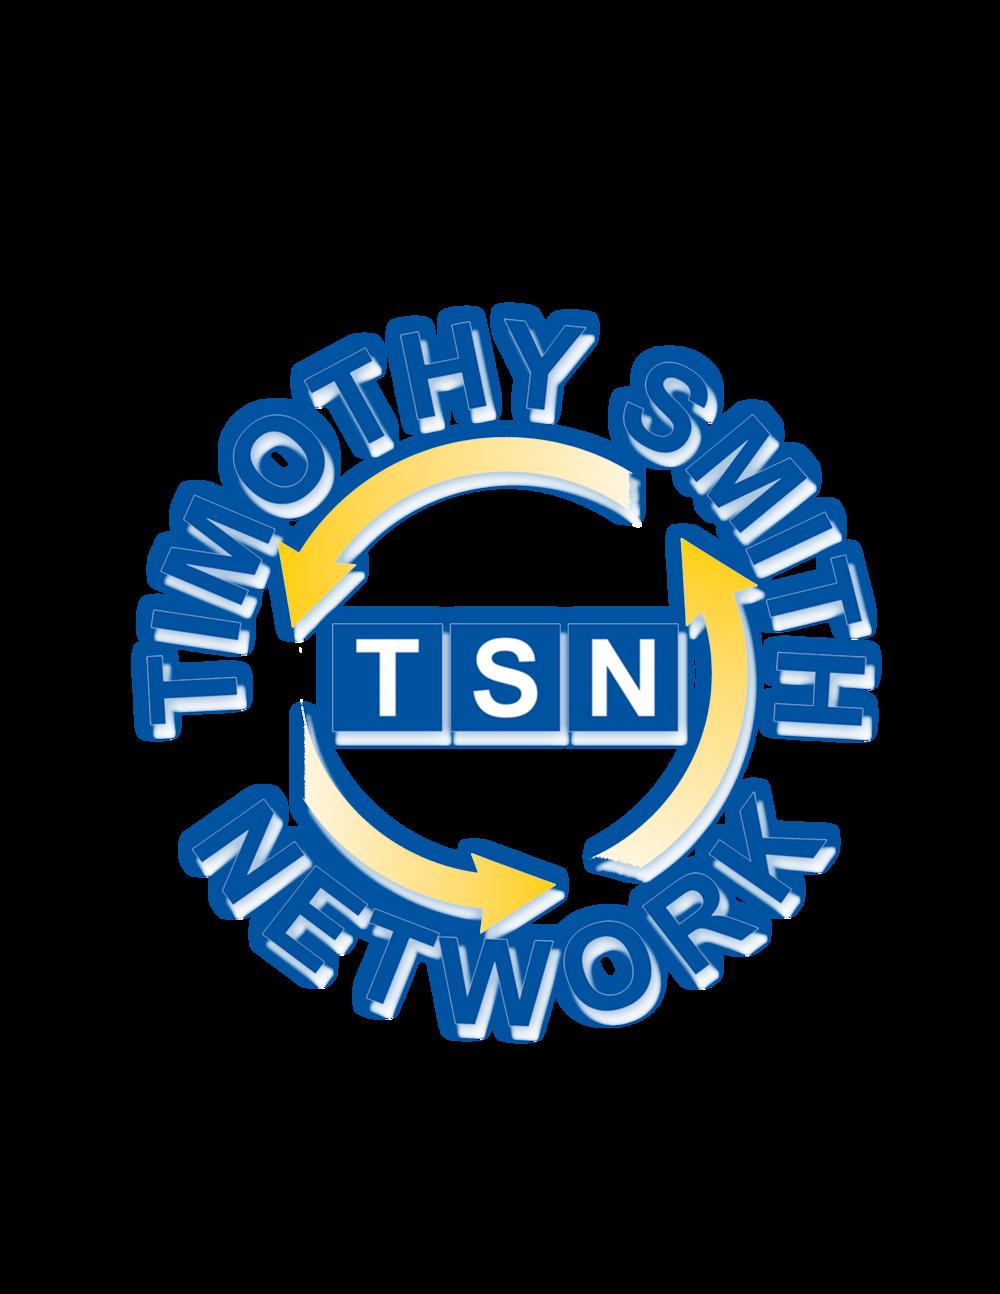 TSN-LOGO New.png